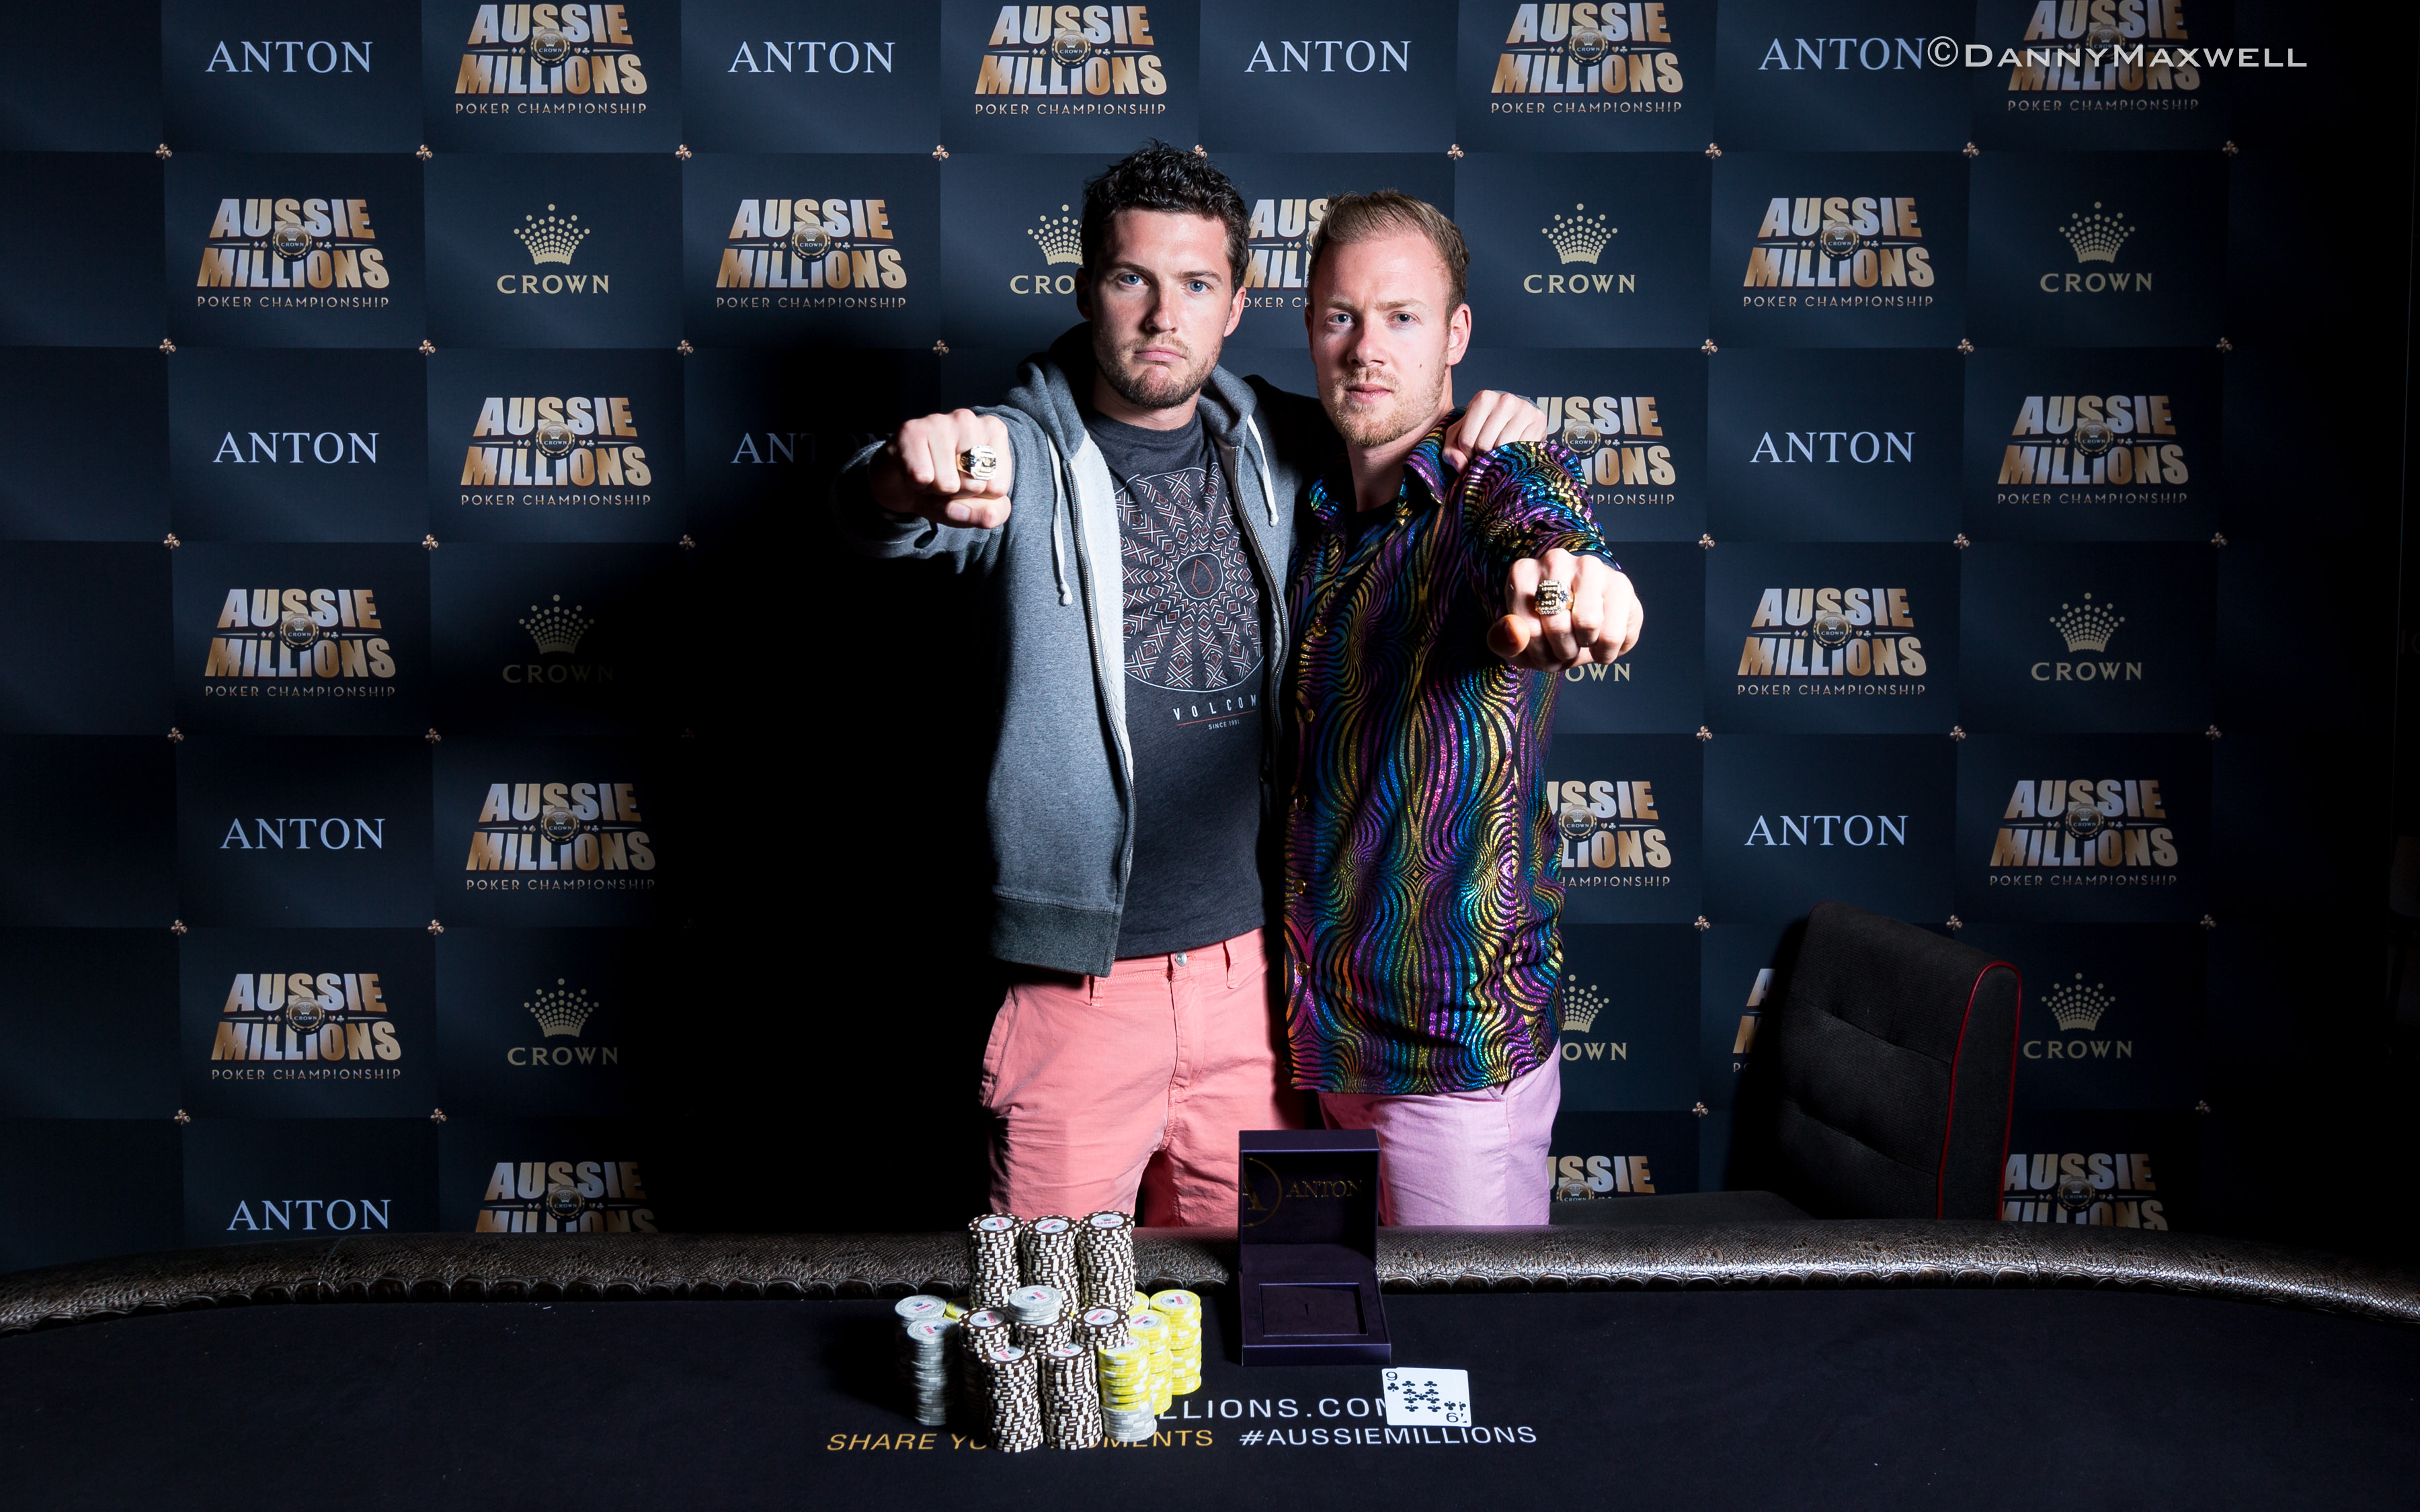 Terry Schumacher Beats David Yan to Win Aussie Millions Short Handed Event (AUD6,305) 101